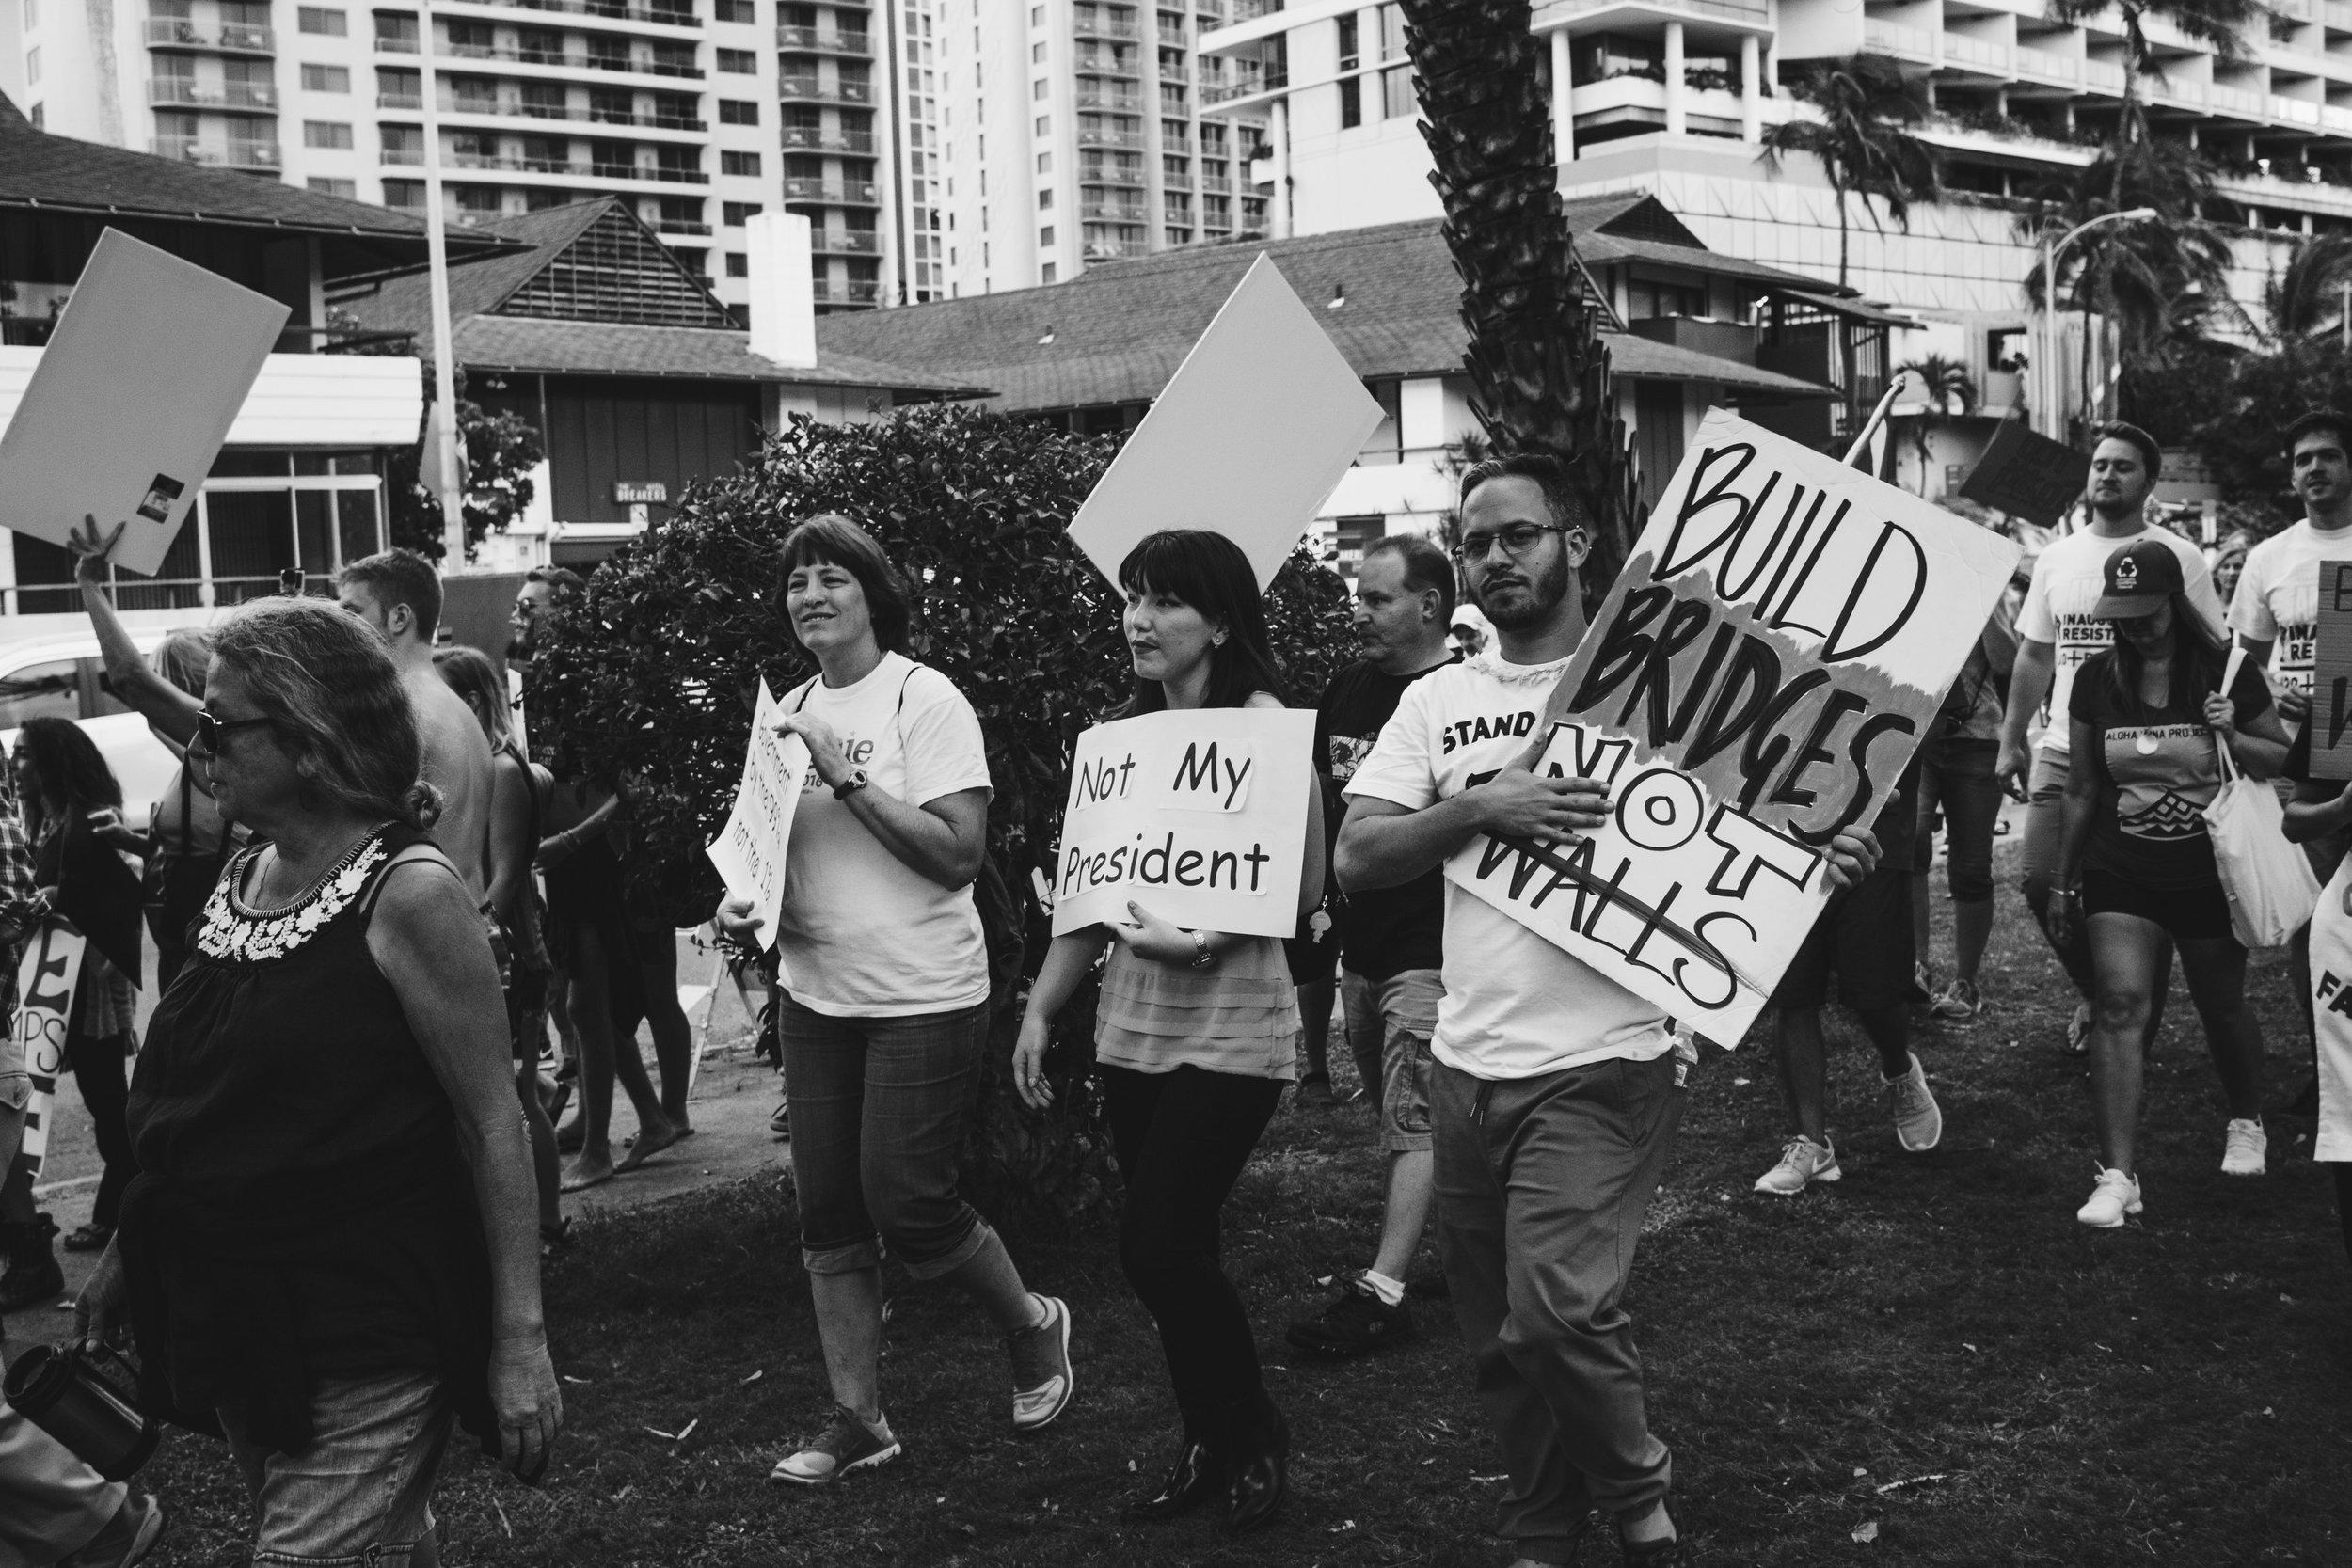 protest-7.jpg